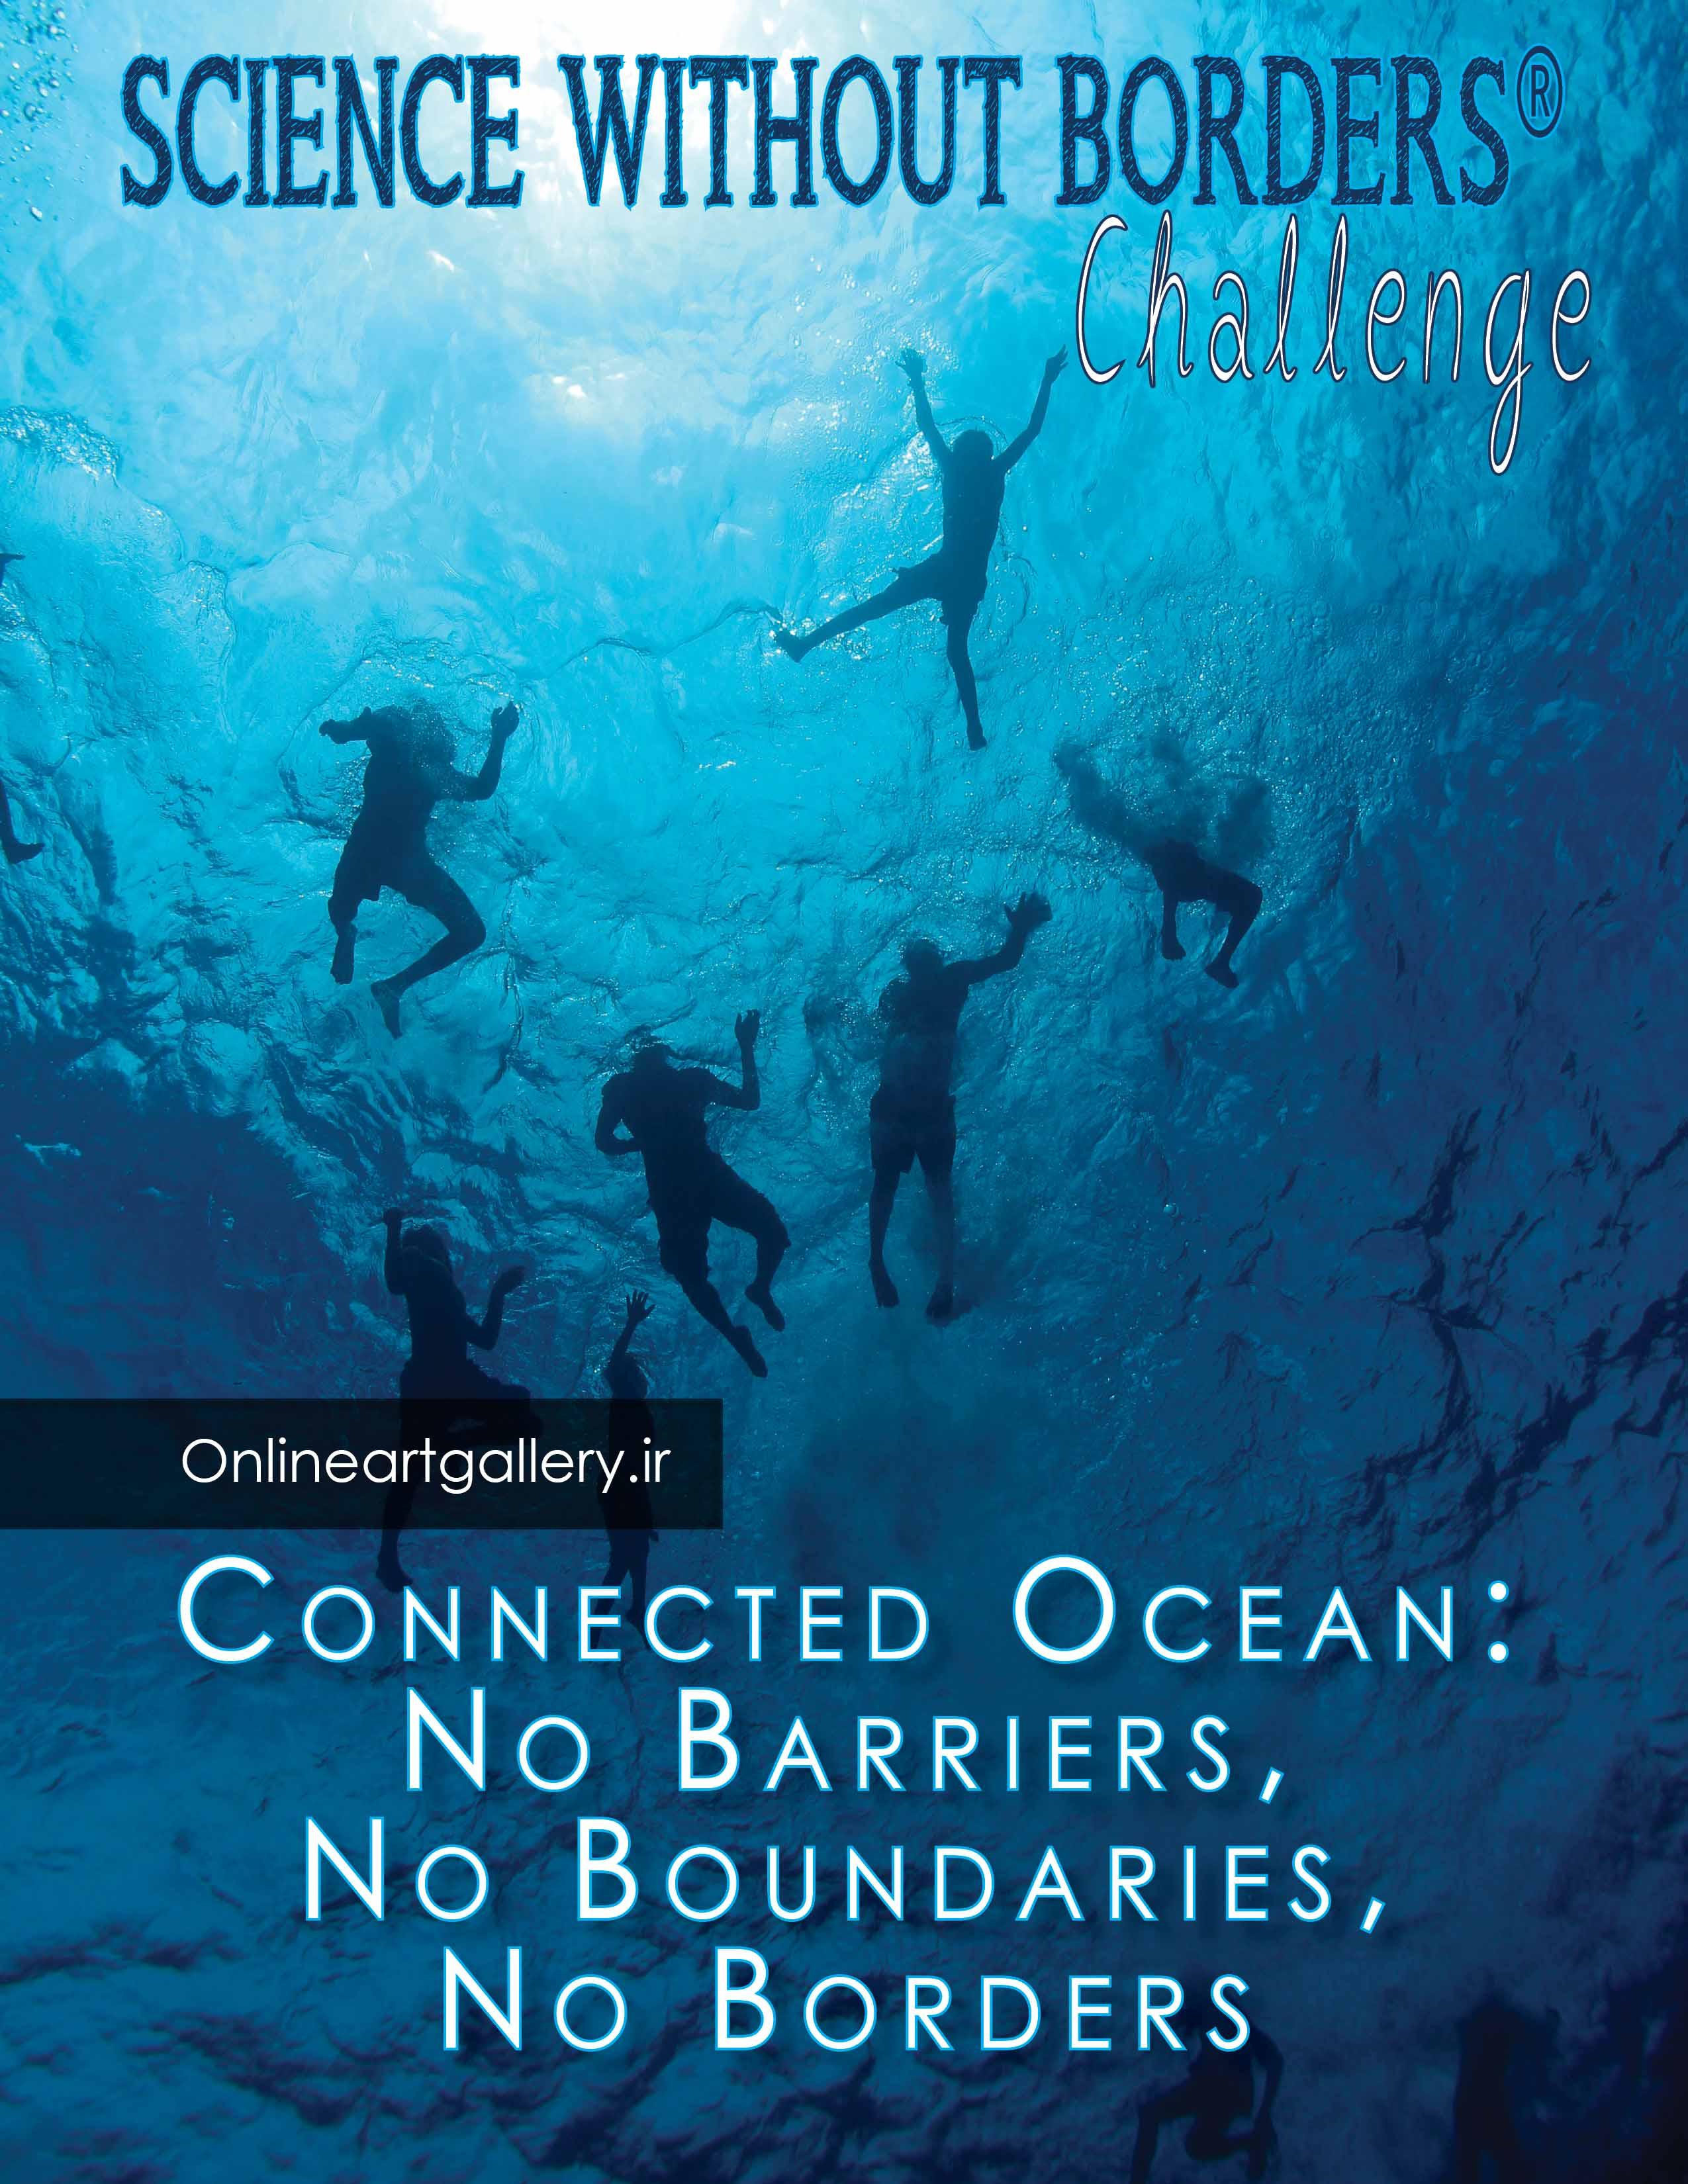 فراخوان چالش علم بدون مرز: اقیانوس متصل